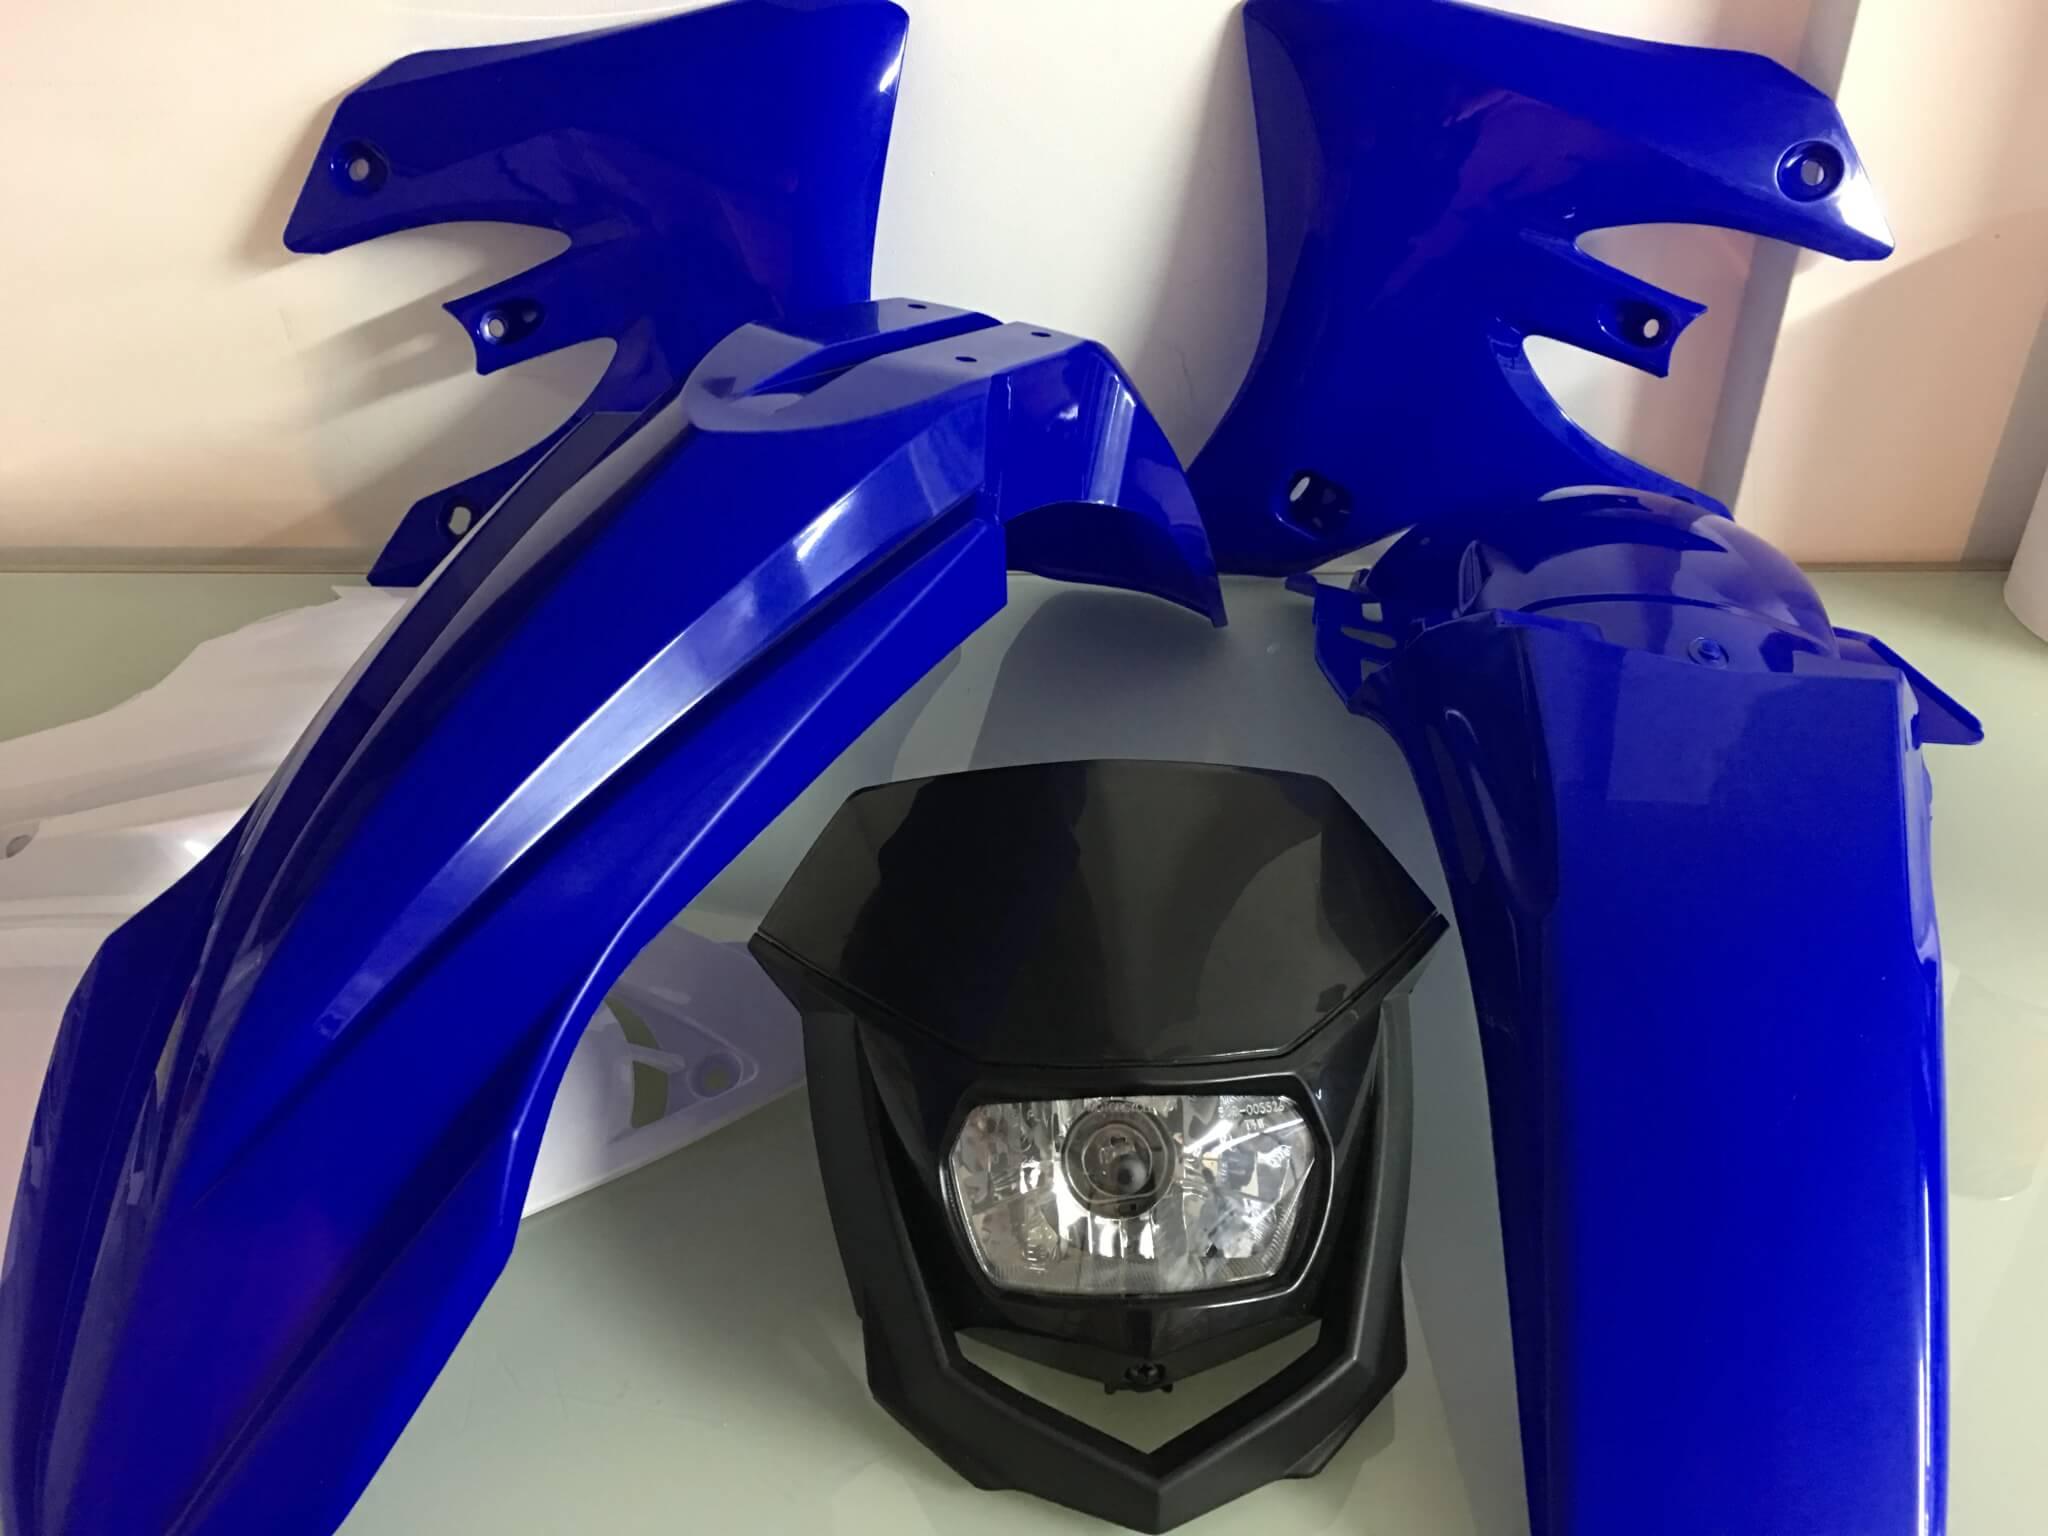 Kit De Plásticos Yamaha Wrf